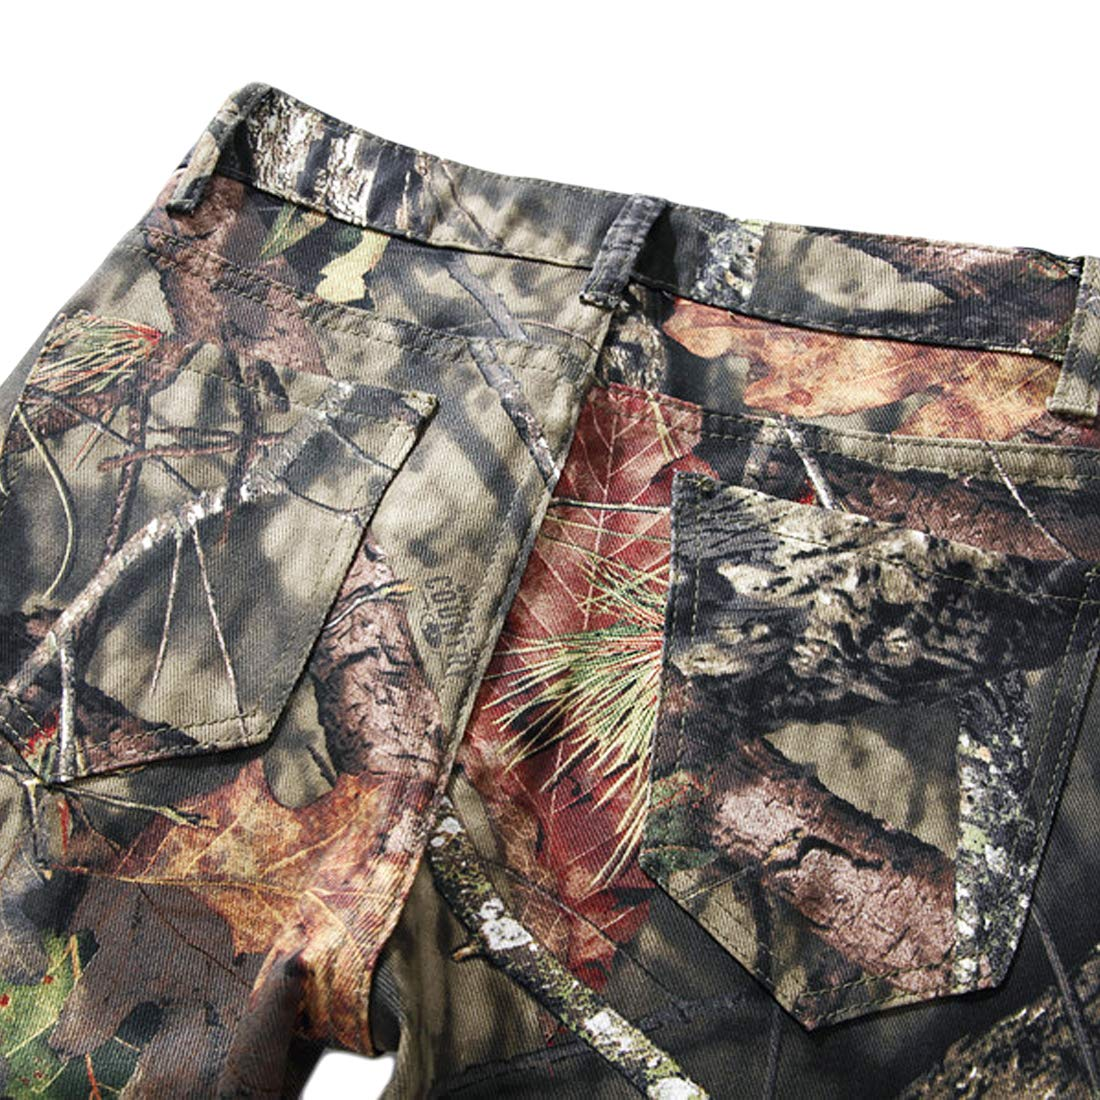 Geurzc Mens Fashion Pattern Jeans Skinny Slim Fit Comfort Stretch Denim Pants for Men Green